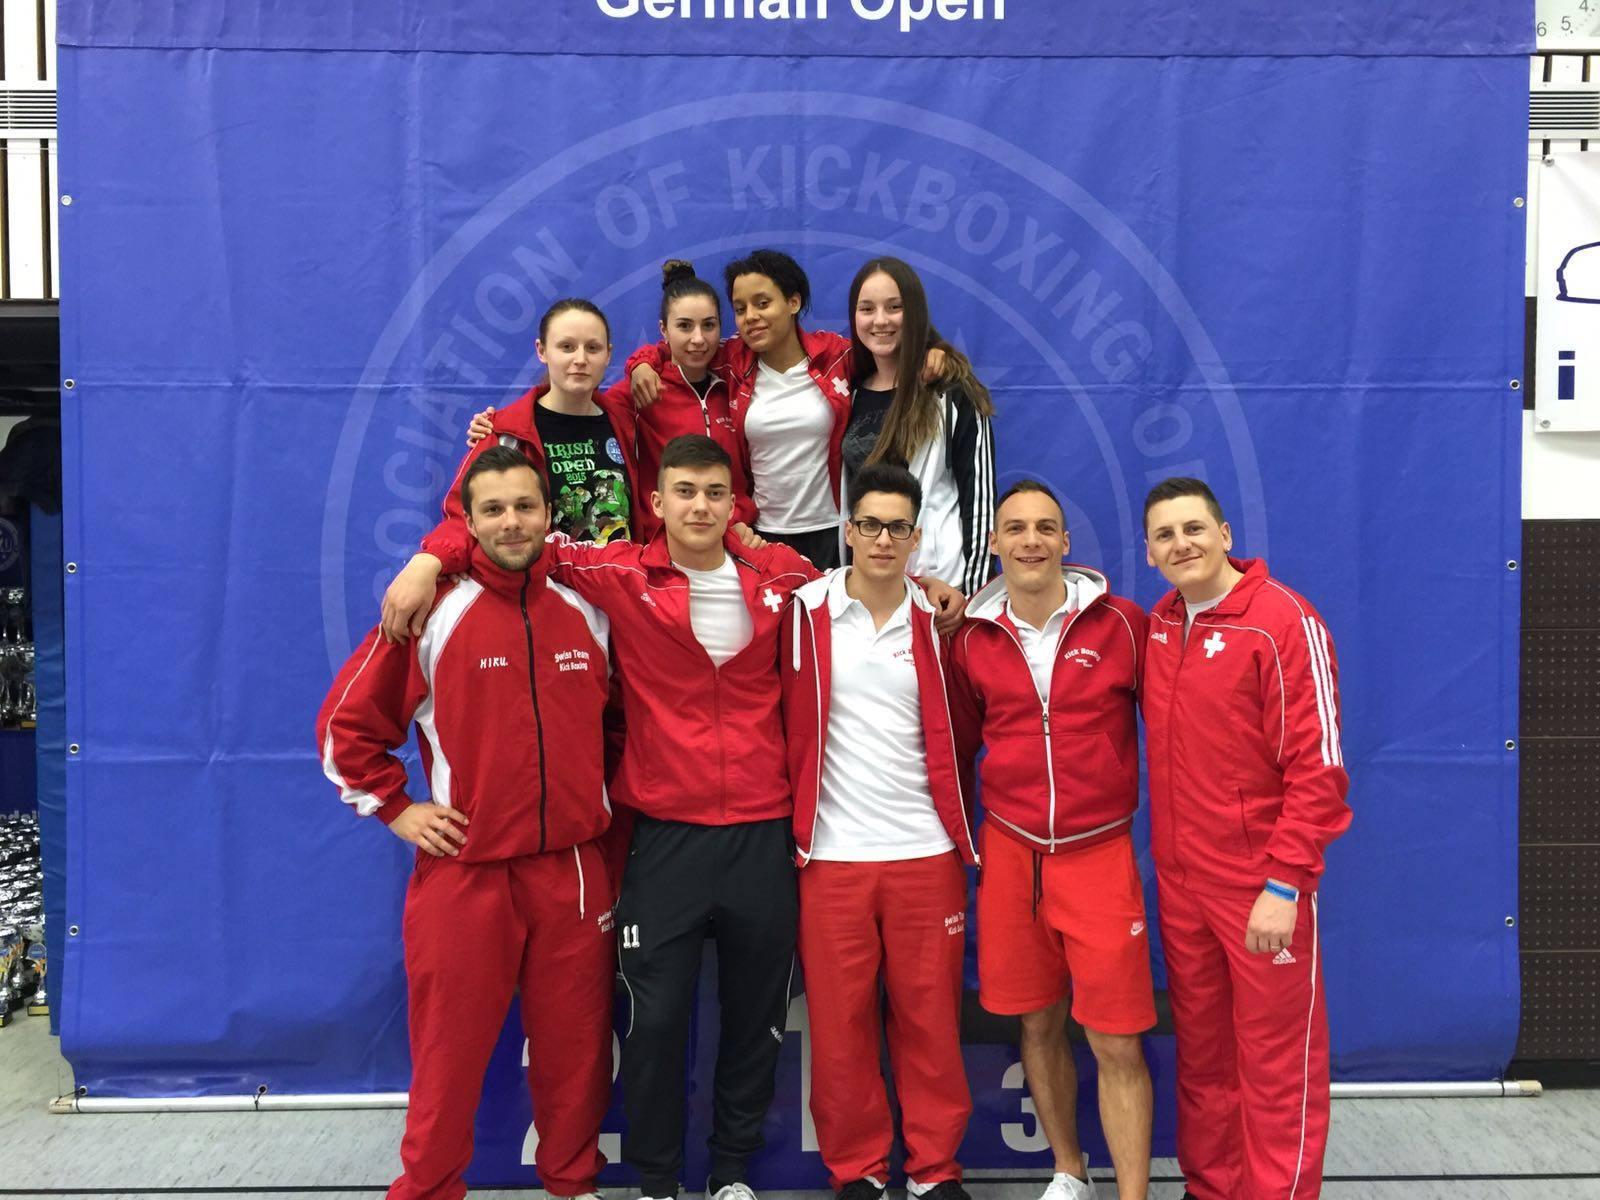 54_PF-Team@German Open16